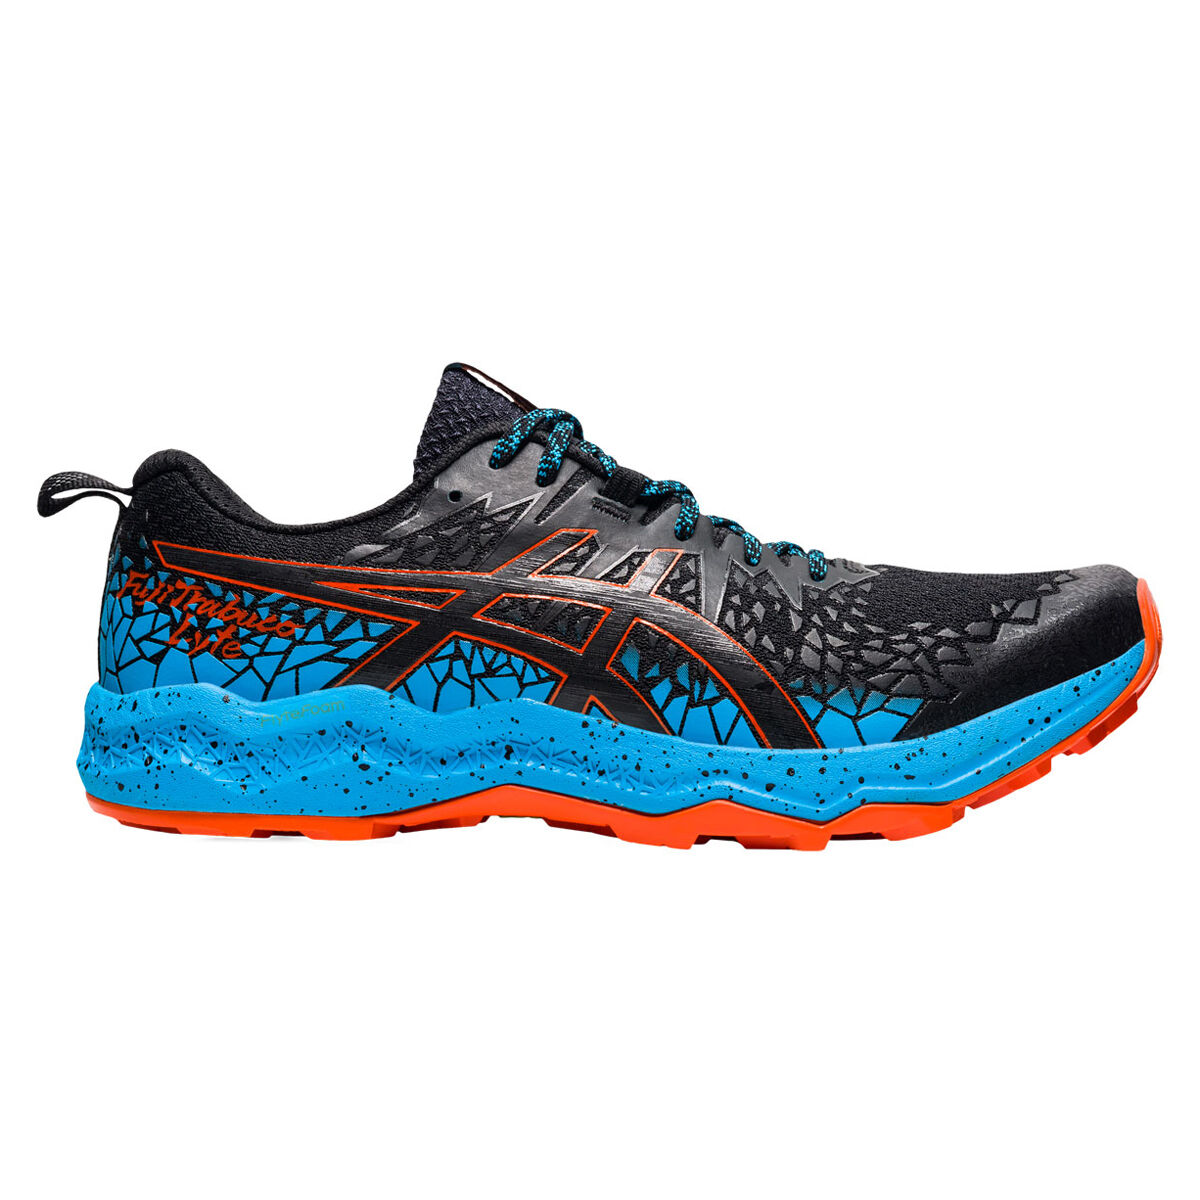 nike high wide heel sneakers black shoes | Asics Fuji Trabuco Lyte Mens Trail Running Shoes